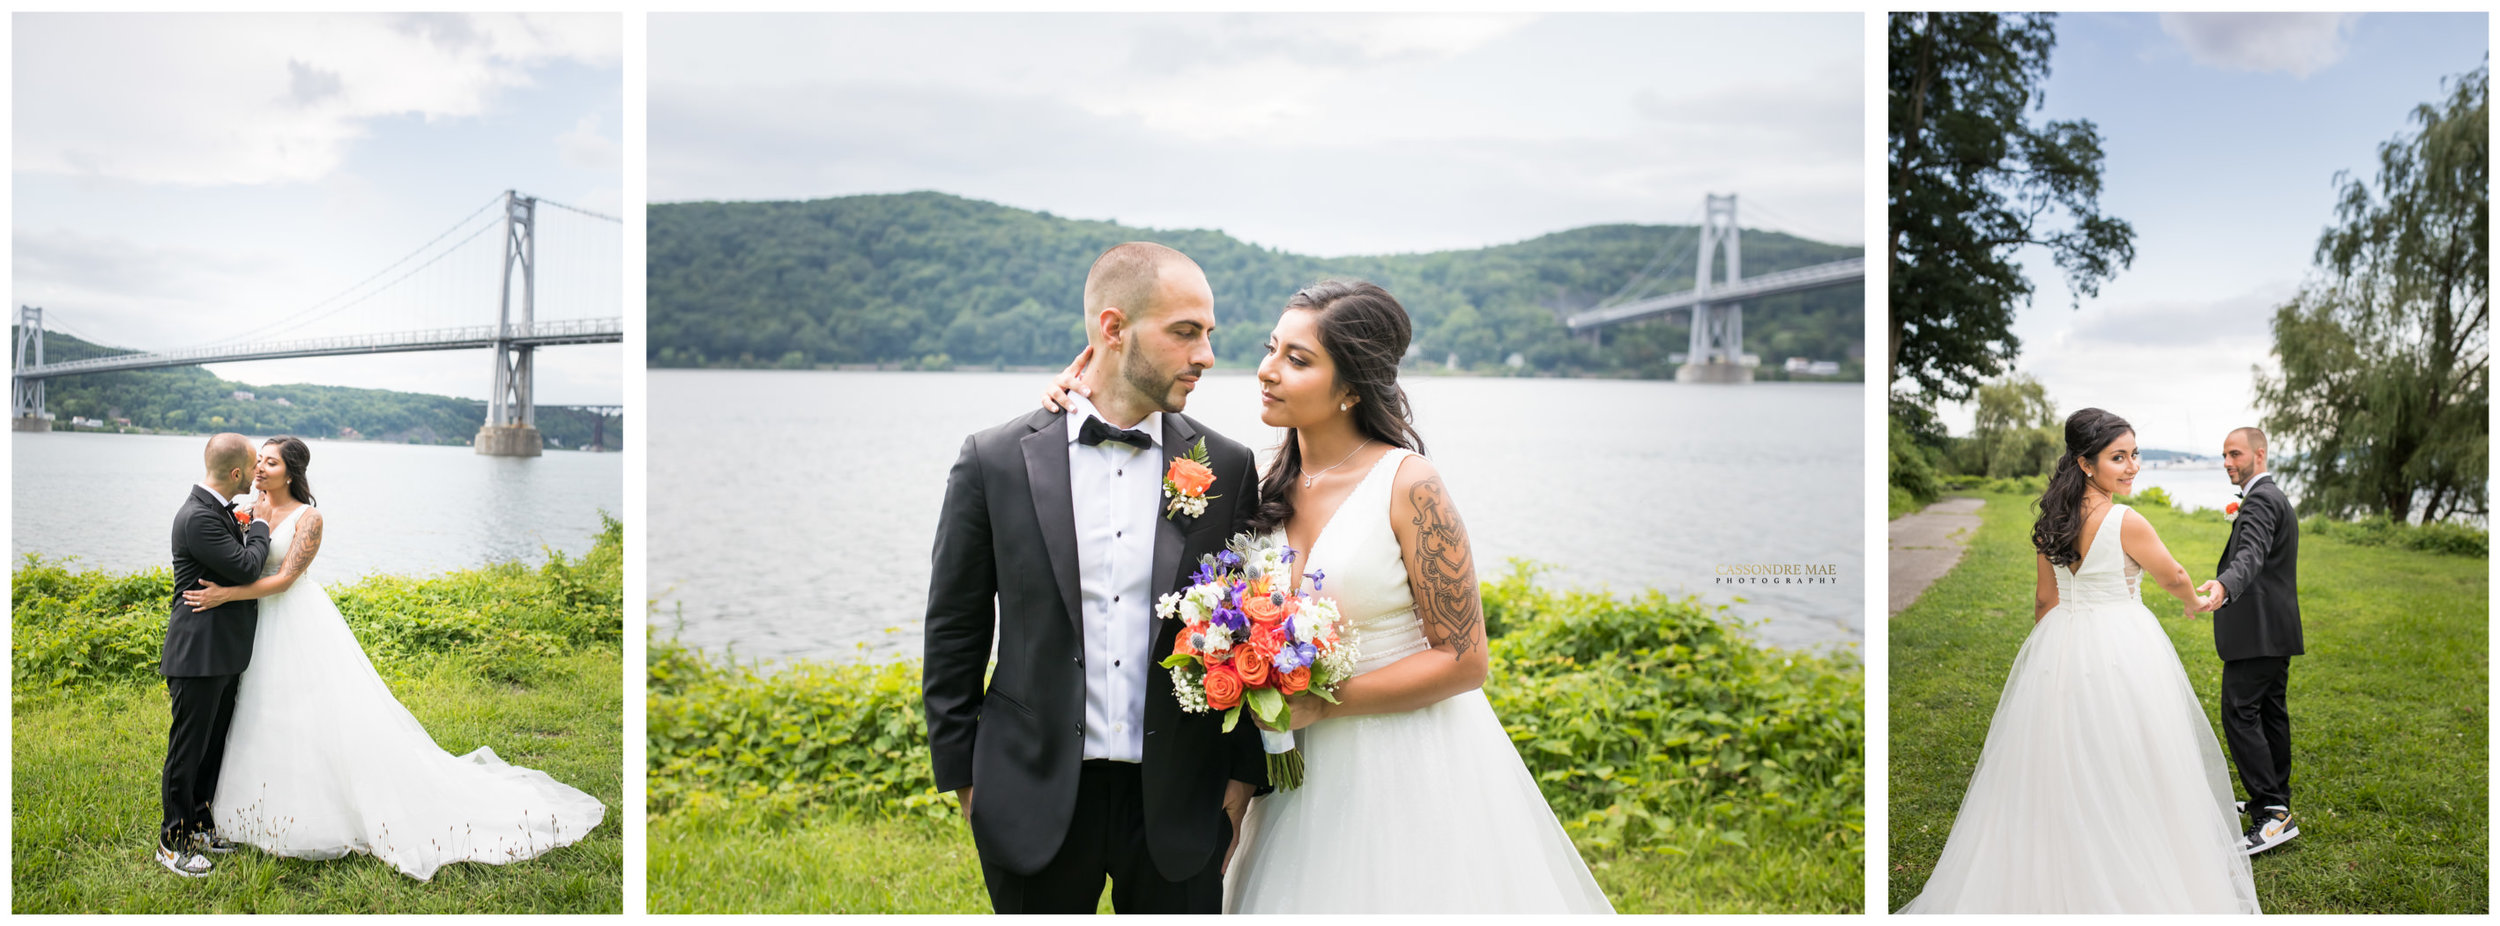 The Grandview Weddings Poughkeepsie New York